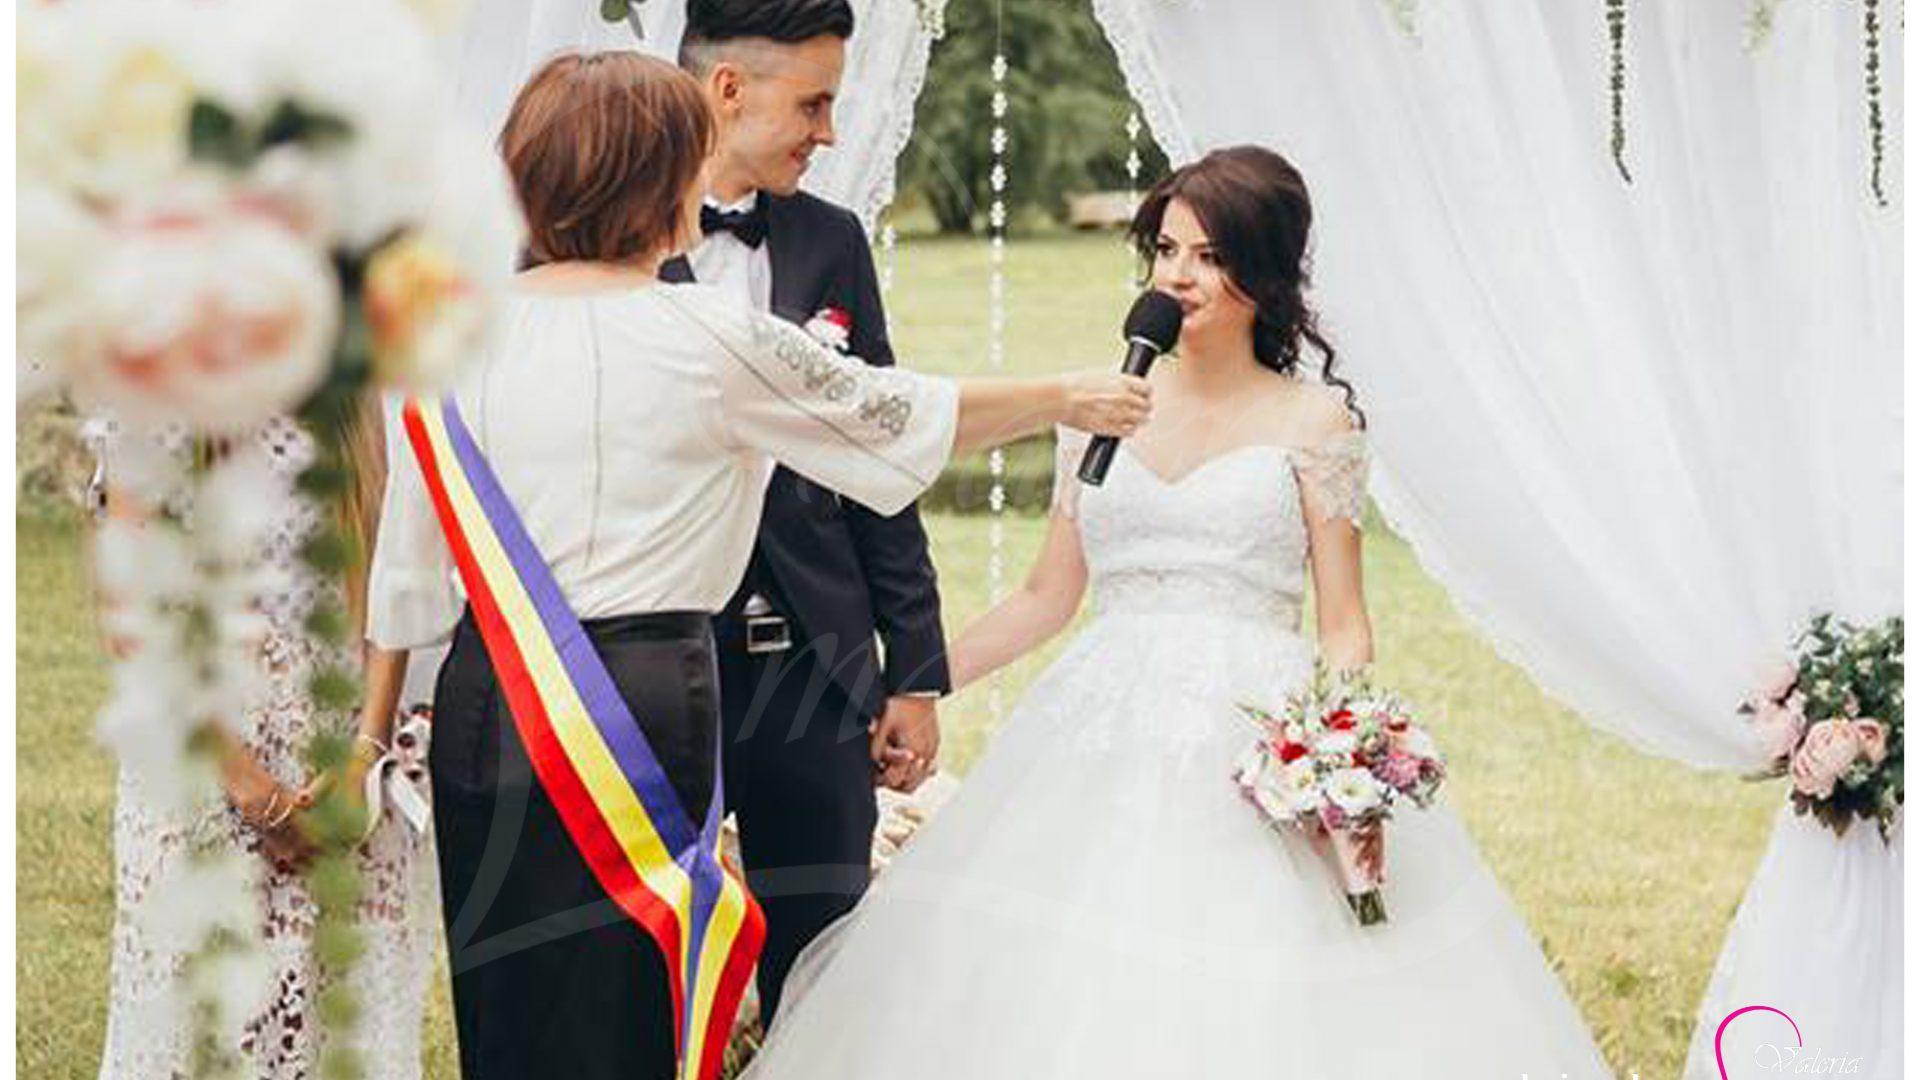 Inregistrarea casatoriei sub cerul liber Agentia Valeria Mariage 069787665 www.valeria (1)